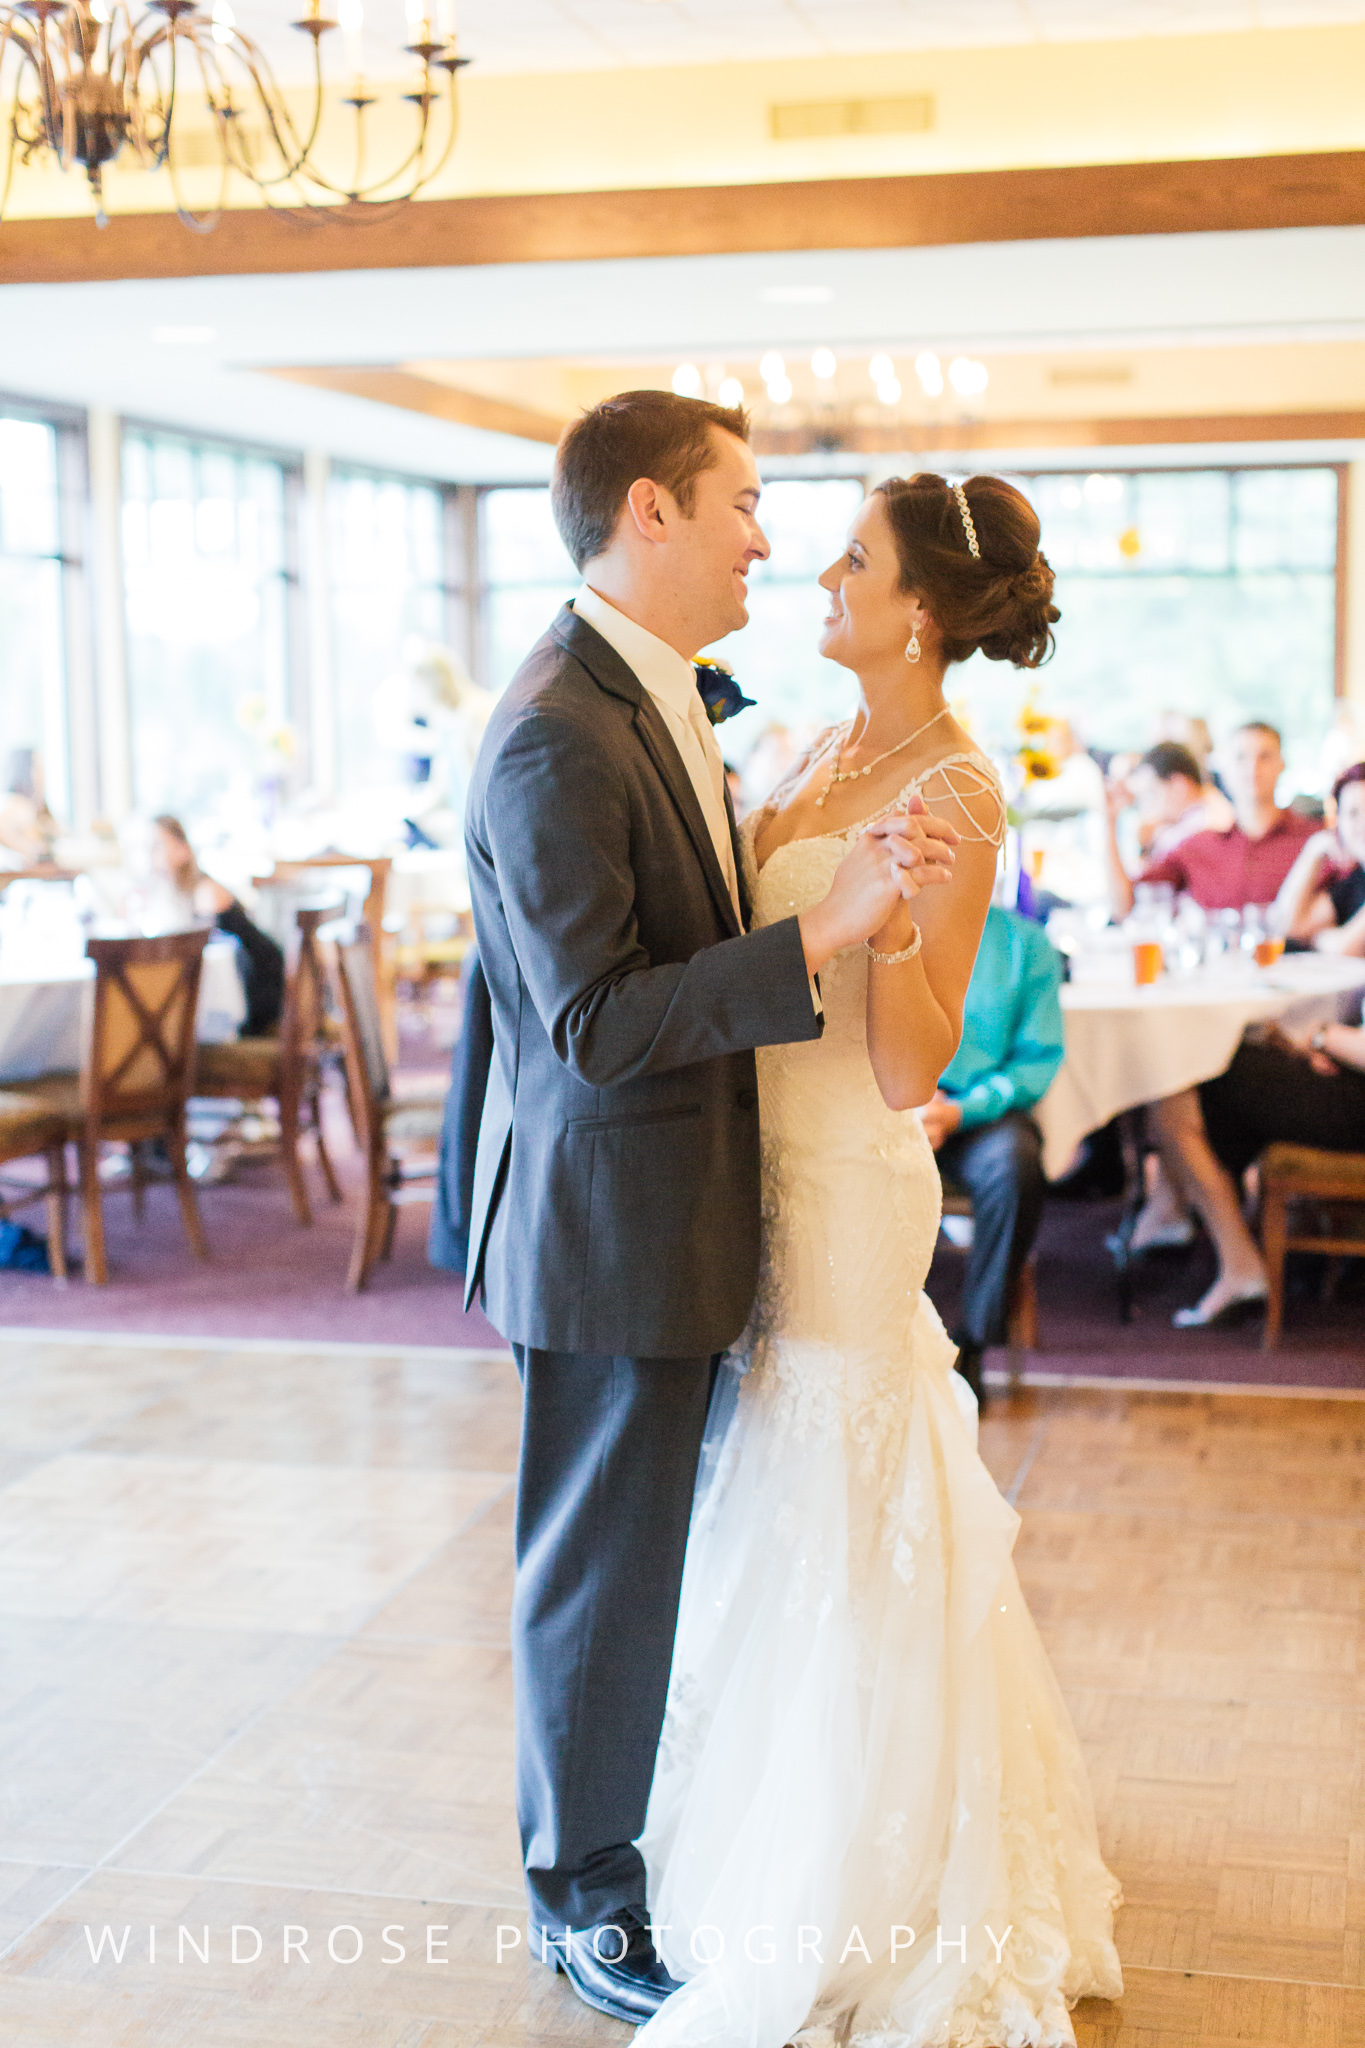 La-Crosse-Country-Club-Wedding-Minnesota-Wedding-Photographer-44.jpg